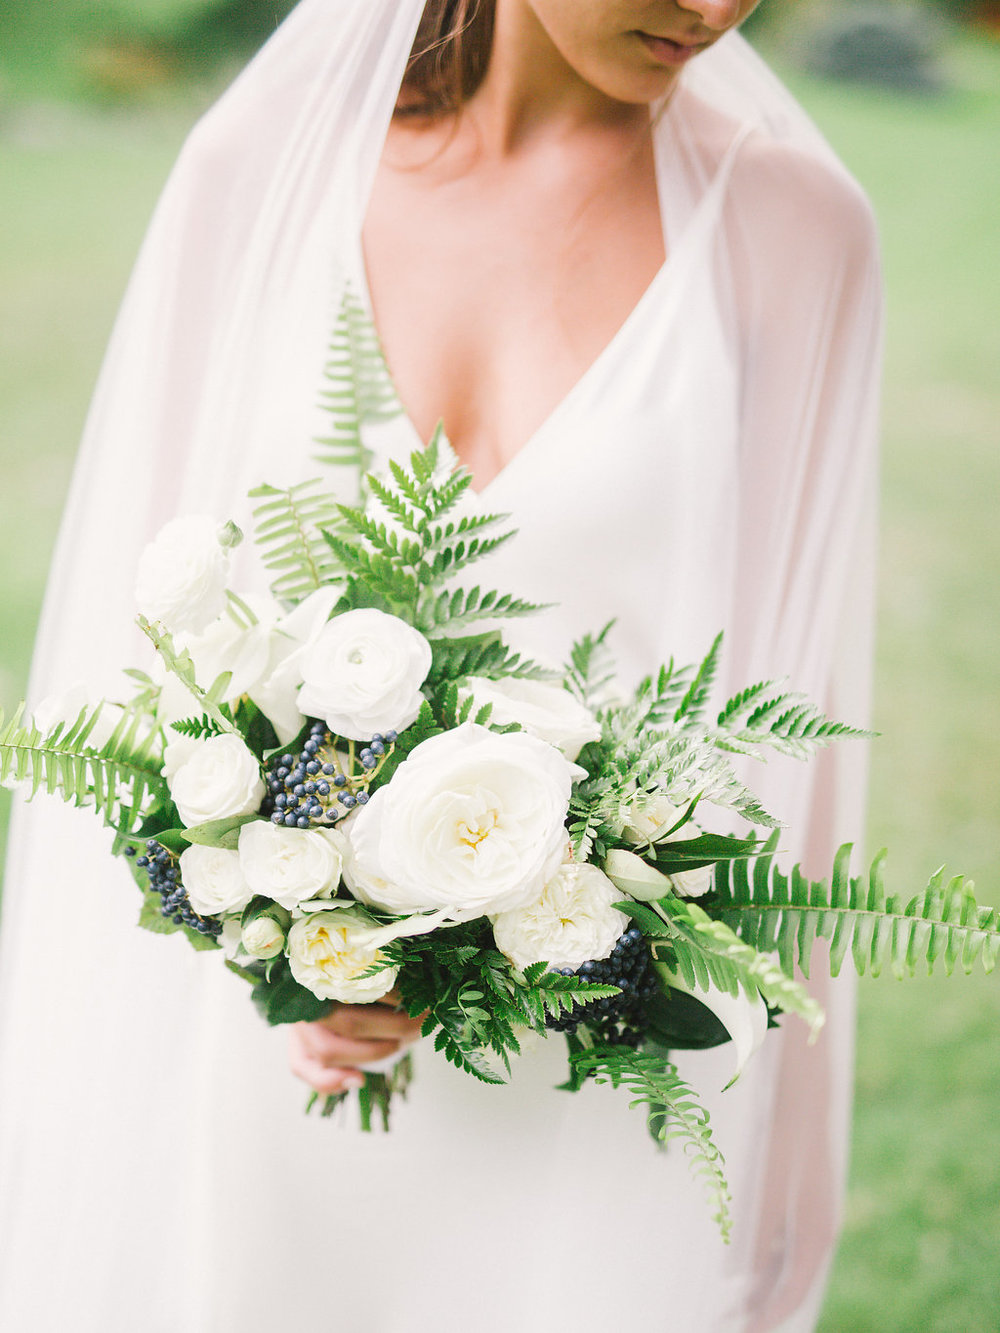 Fresh Whites with Lush Ferns Bridal Bouquet | Quill+Oak Floral Design Toronto, Hamilton, Niagara